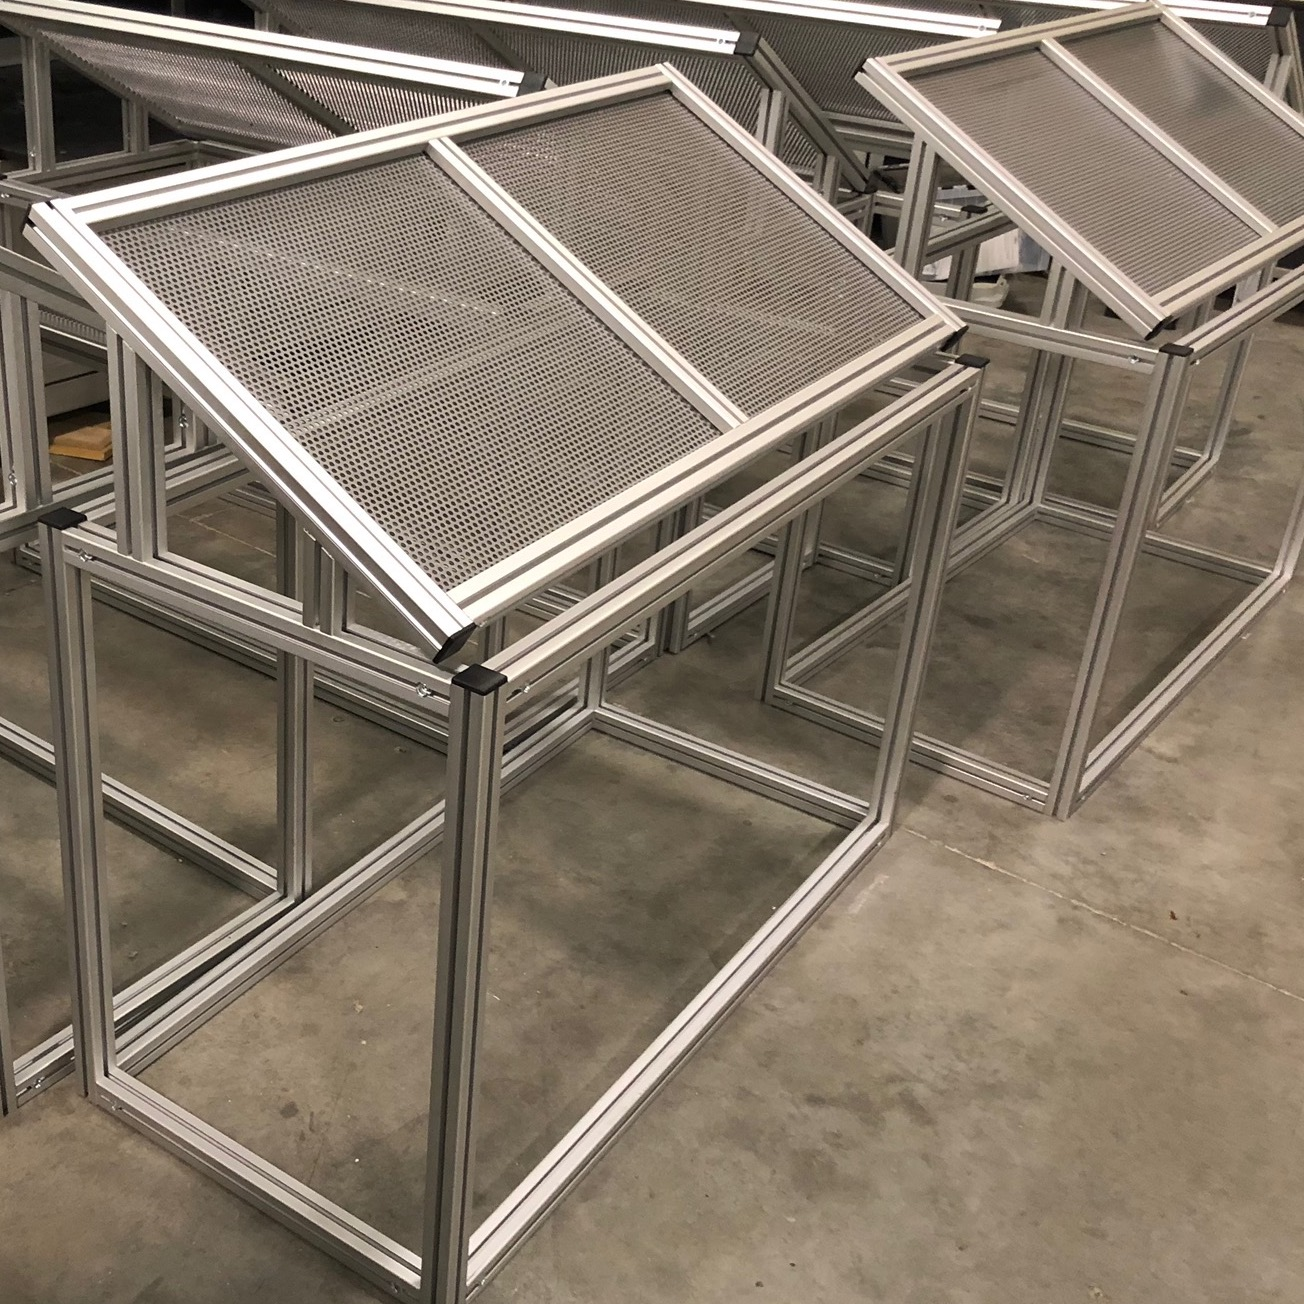 MayTec-assembly-station_Fitz-Thors-Engineering_MayTec-Distributor_Birmingham-AL.jpeg